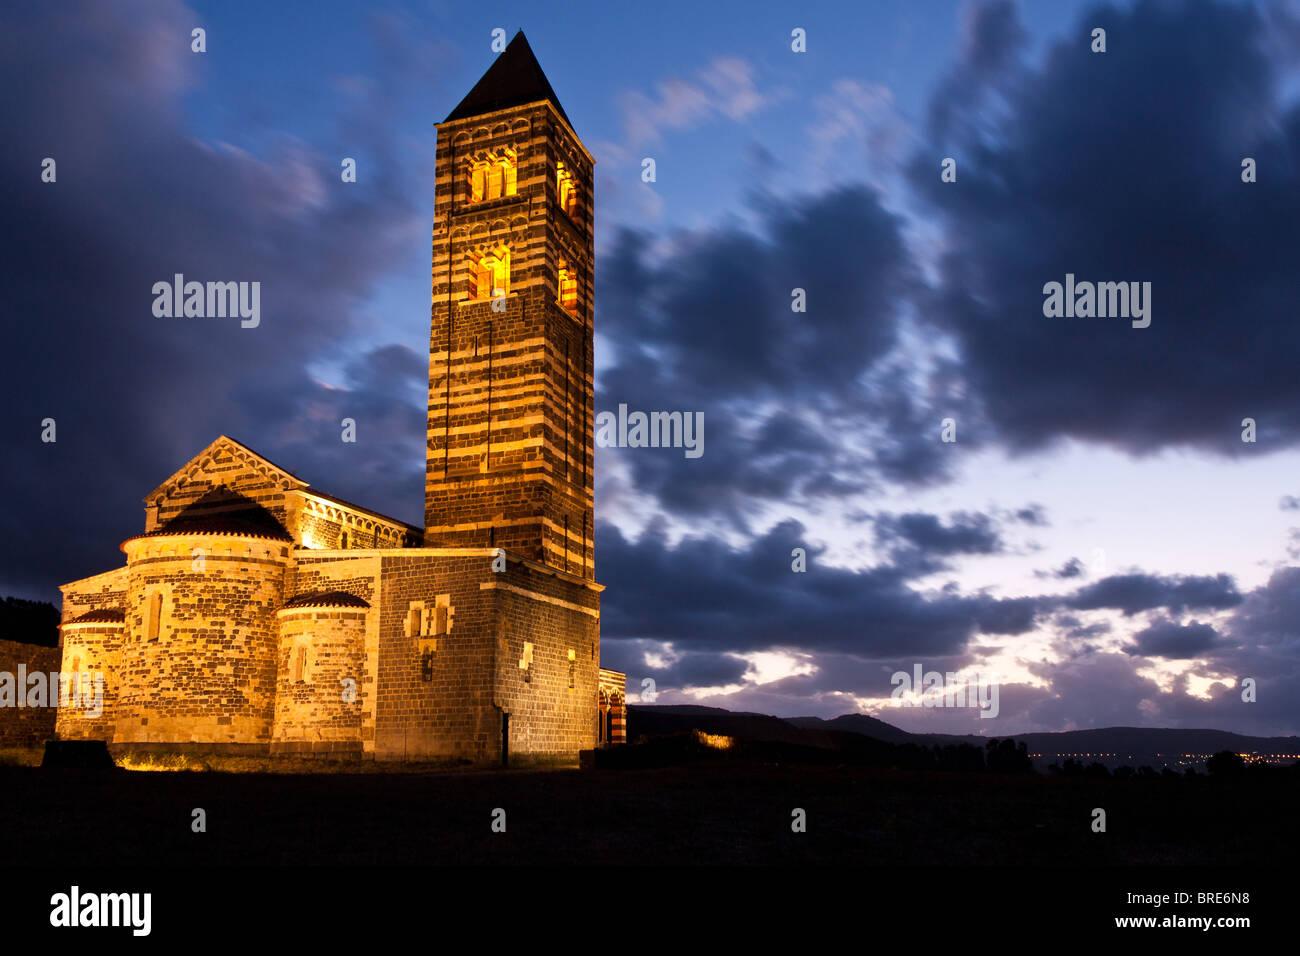 Saccargia's church in northern Sardinia at dusk - Stock Image